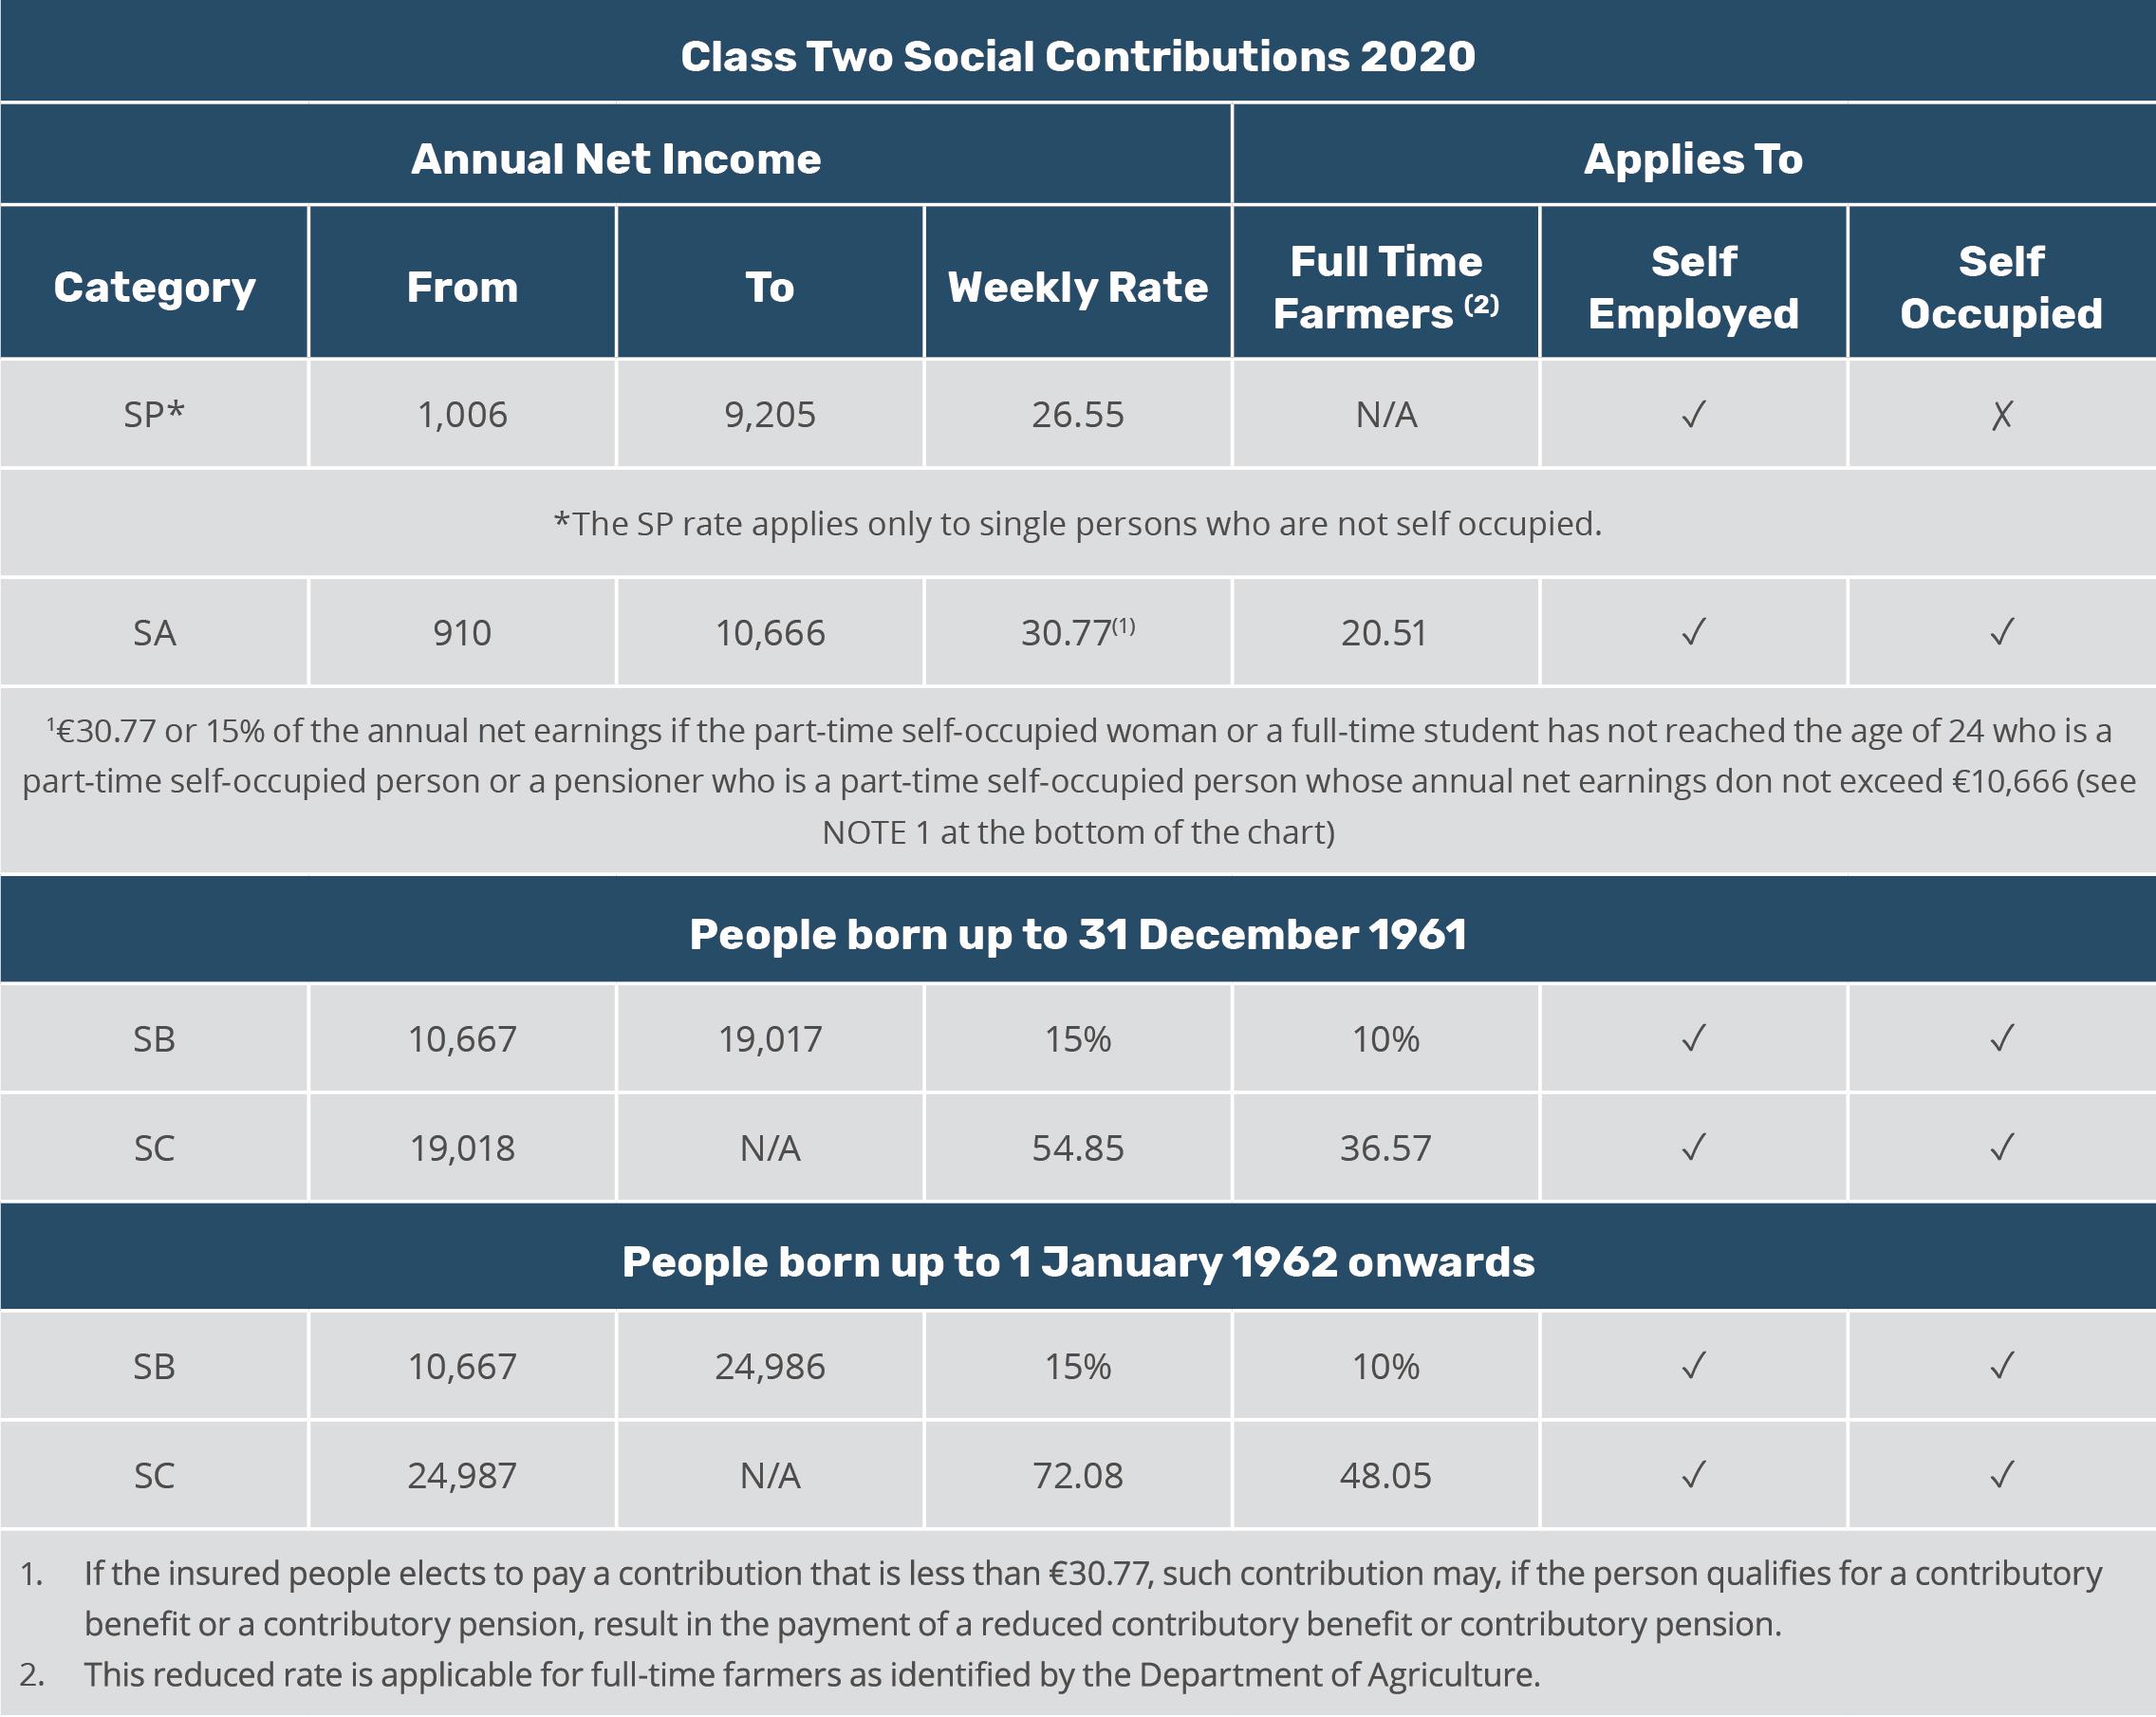 Malta class 2 social contributions 2020